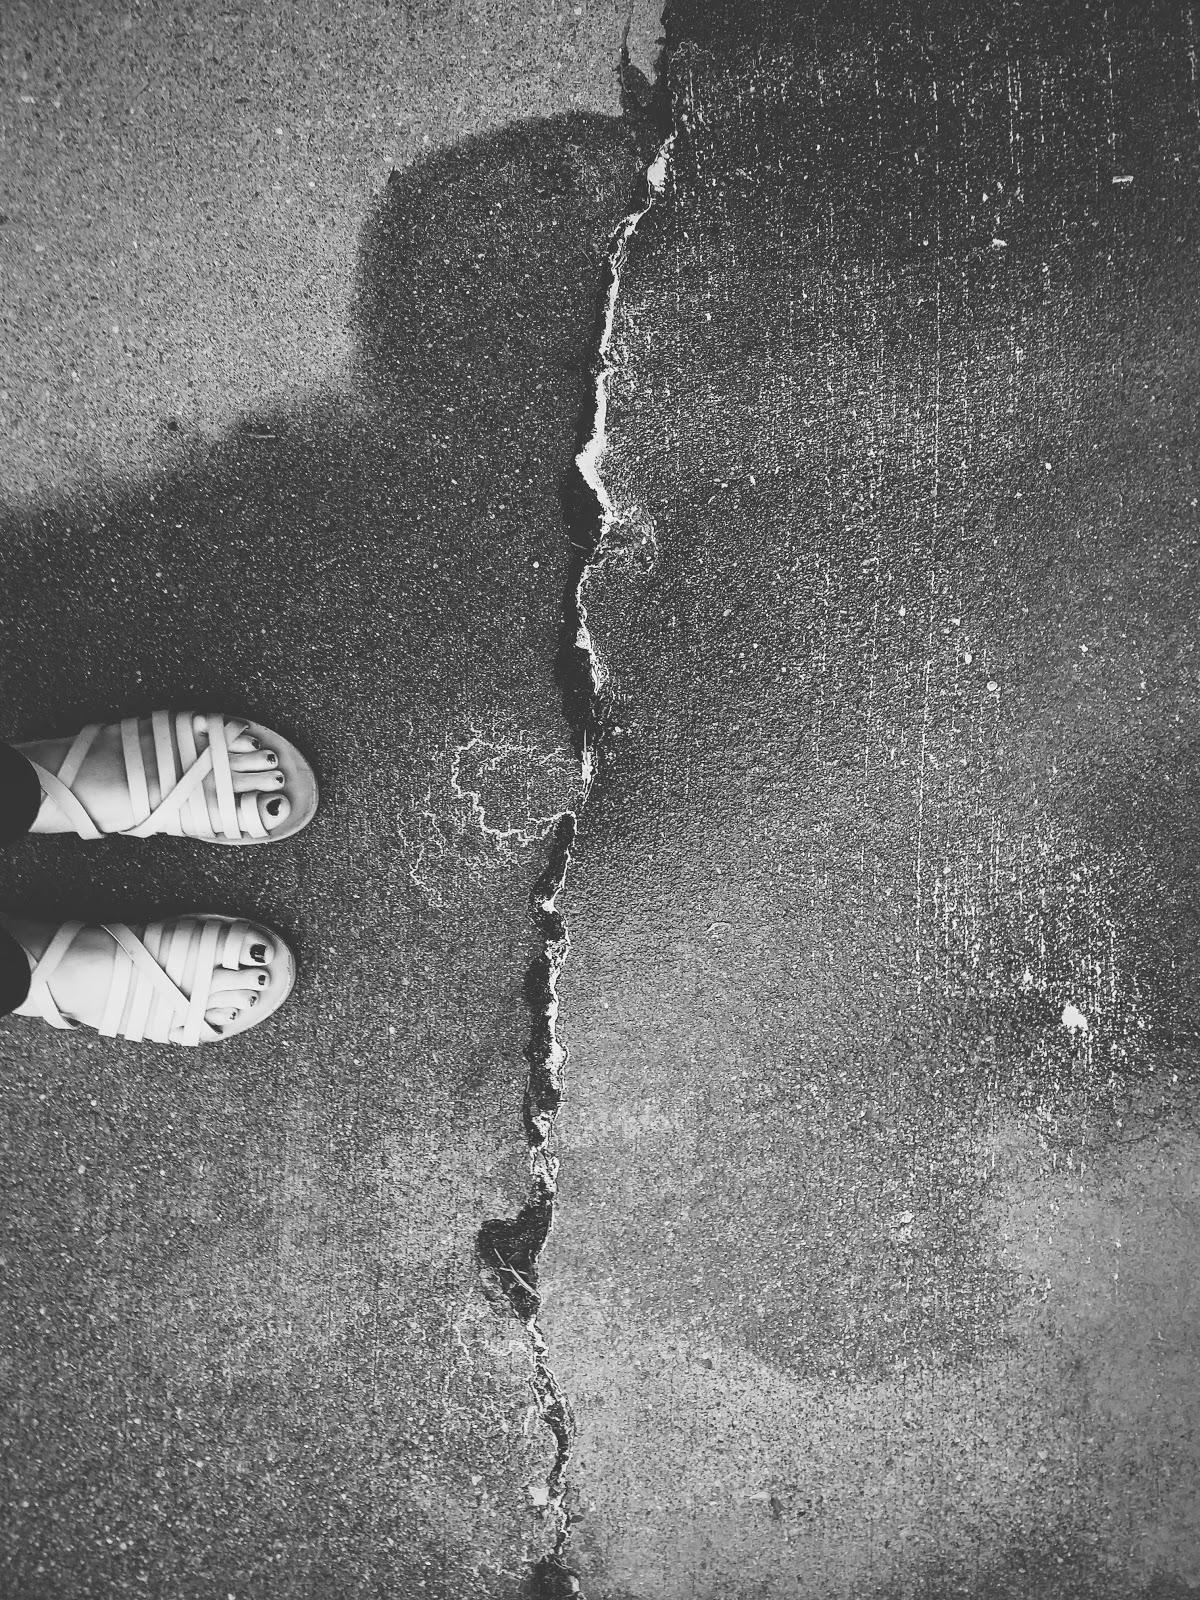 sidewalk crack with pollen // life in black & white series // www.thejoyblog.net